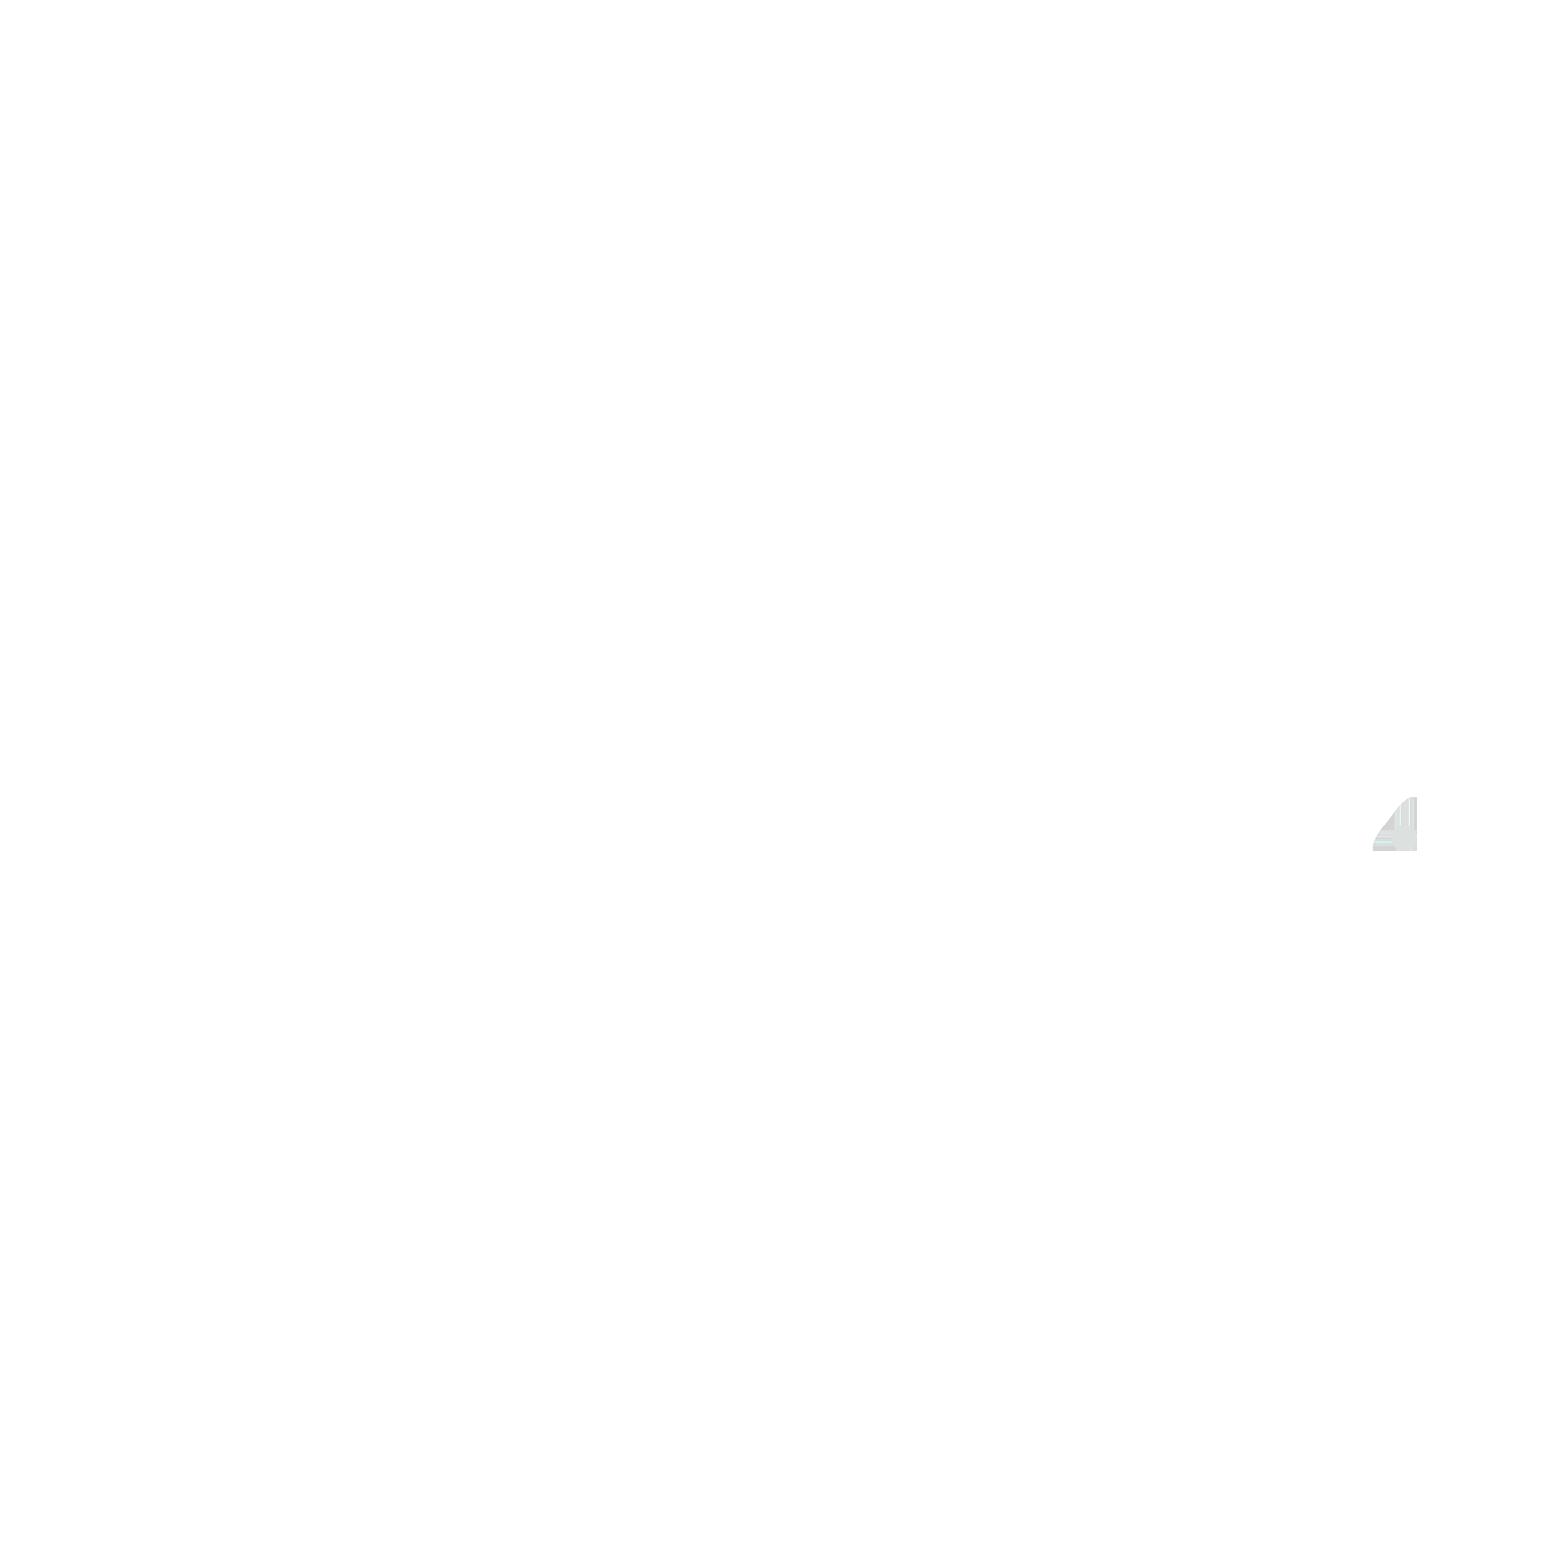 visum-tiffany-logo.png